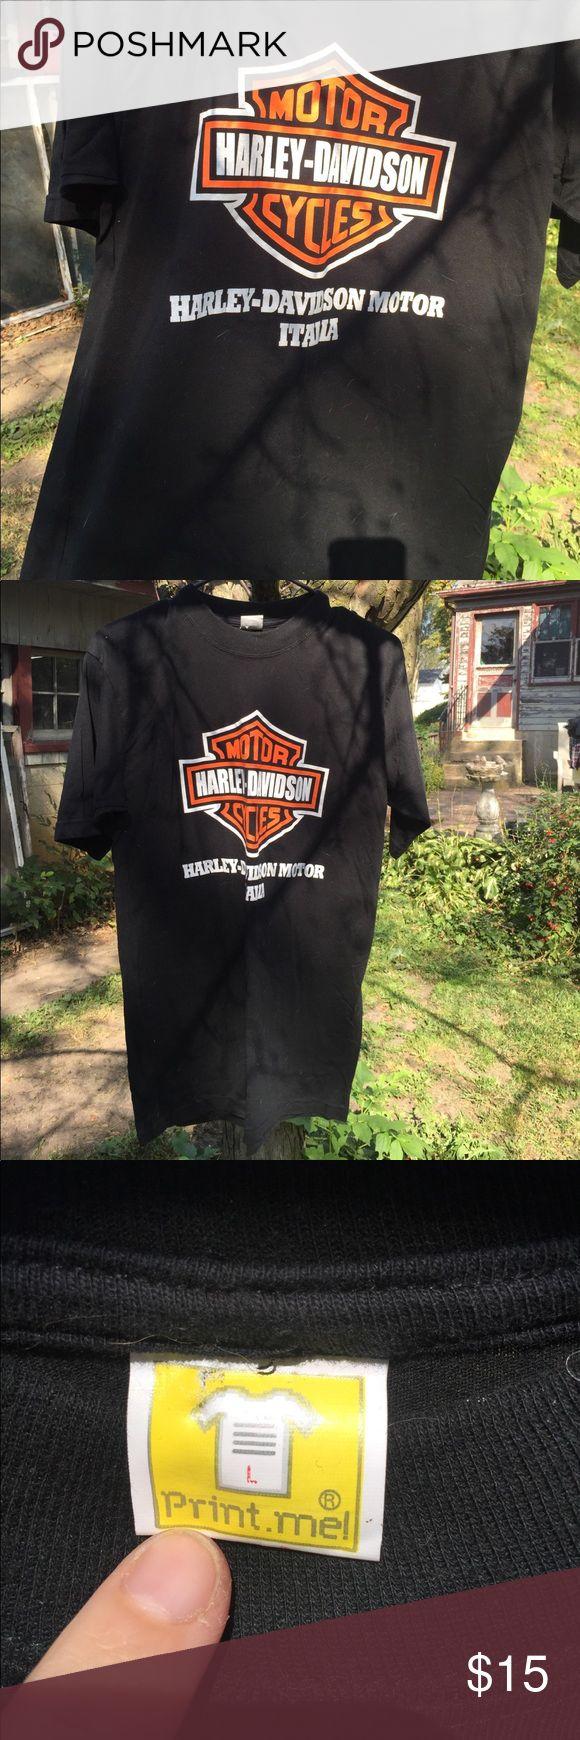 Ultra Soft Harley Davidson Italia Shirt Men's Large  Reasonable offers considered. Bundle discounts based on items. Shirts Tees - Short Sleeve